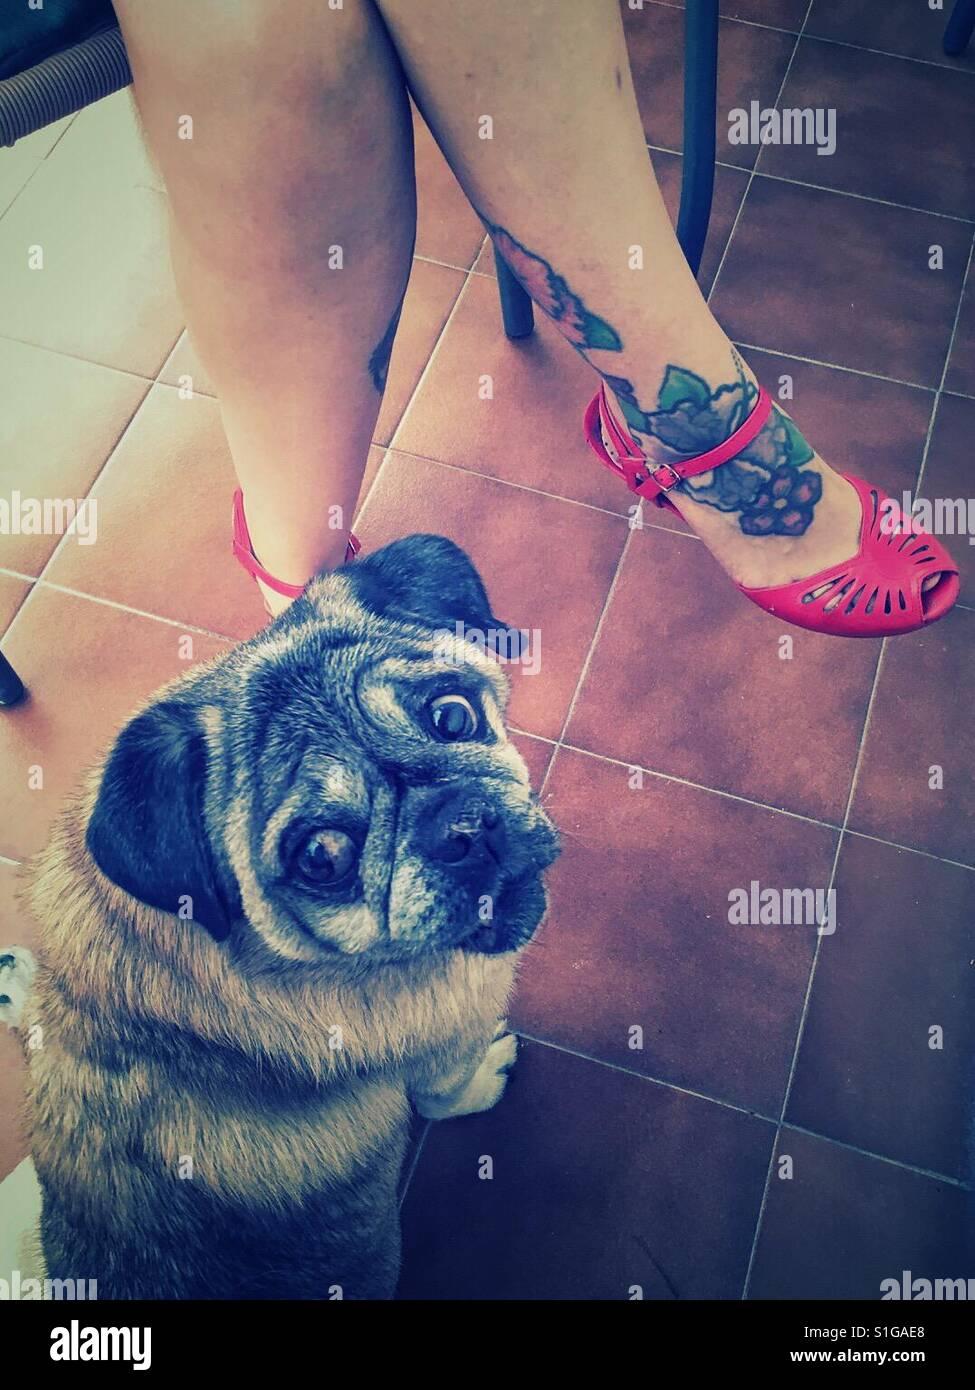 Carlino dog looking to the camera - Stock Image